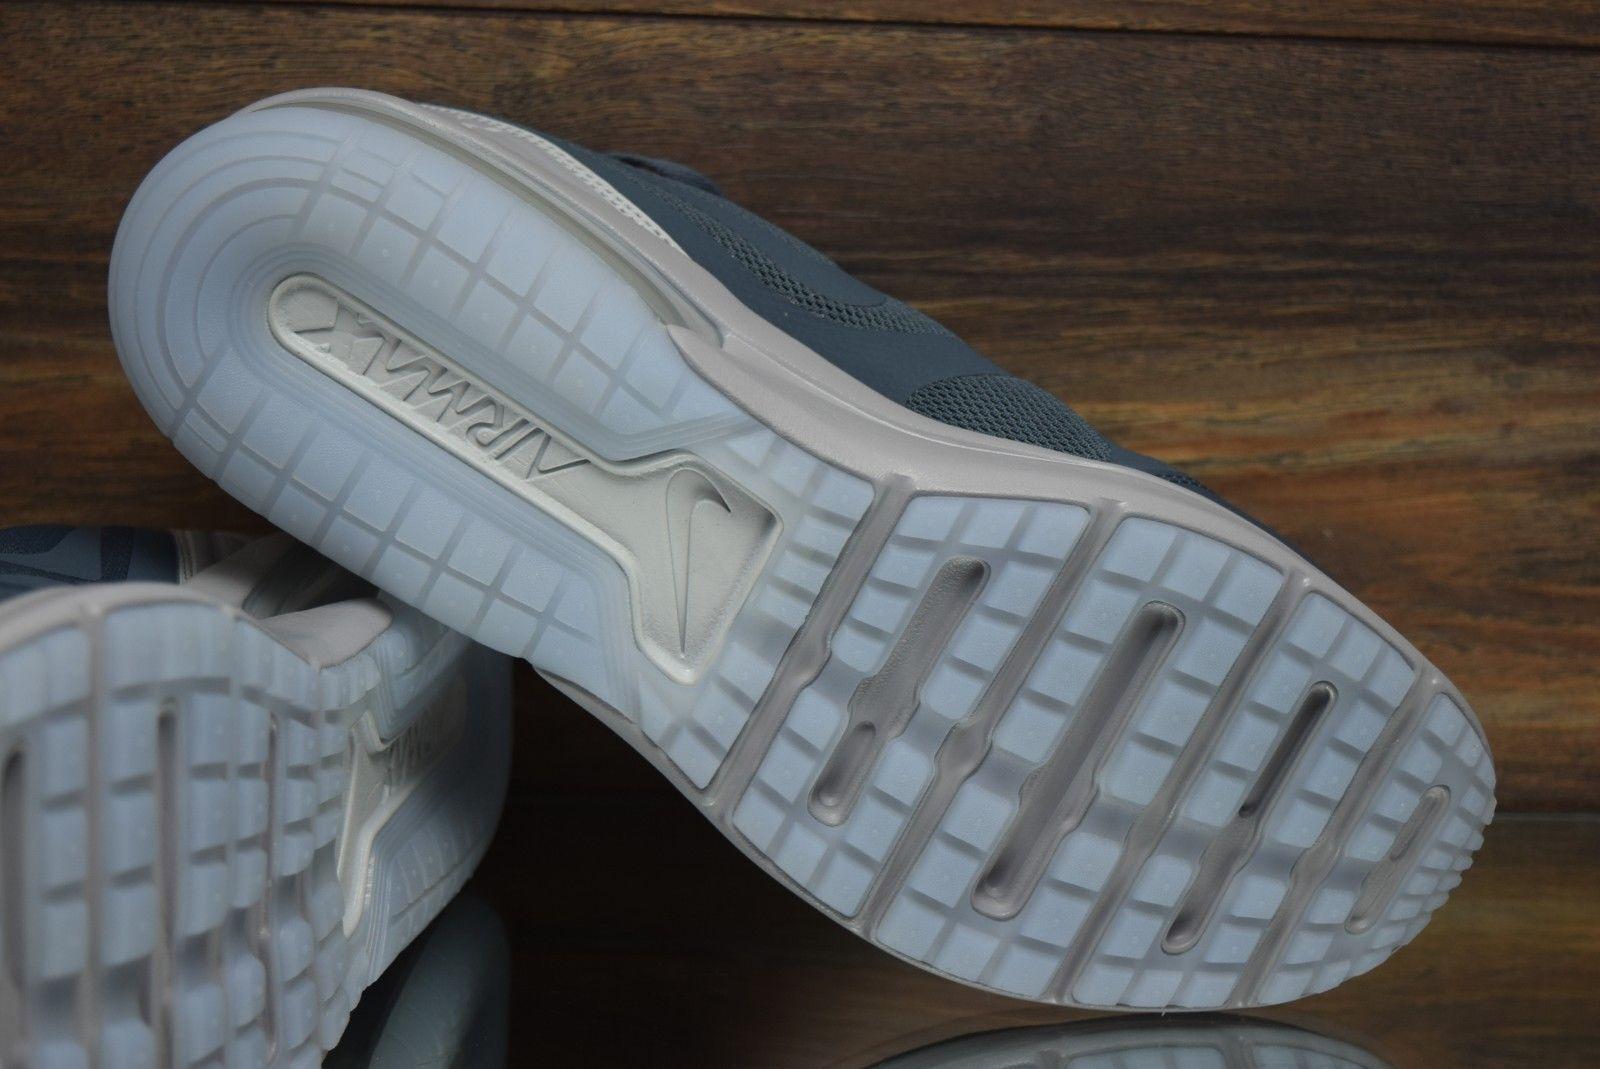 Nike air max wut Blau fox platin aa5739-403 laufschuhe männer größe - multi - größe männer 83b20b